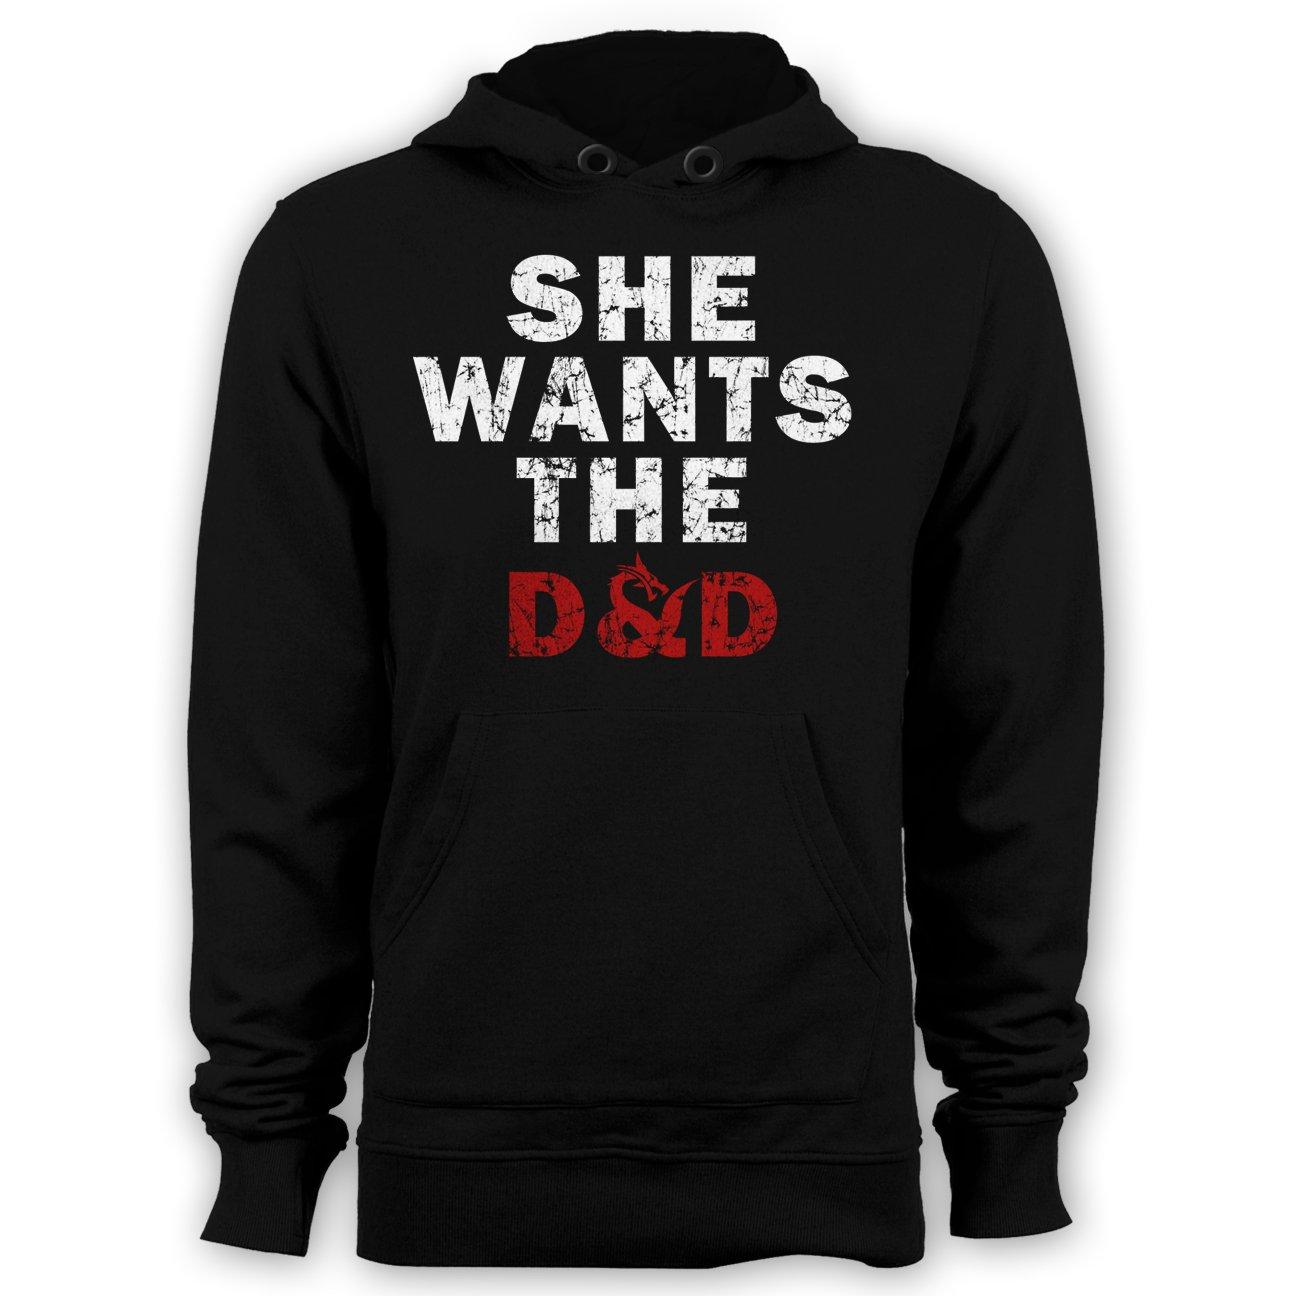 She Wants D&D Hoodie